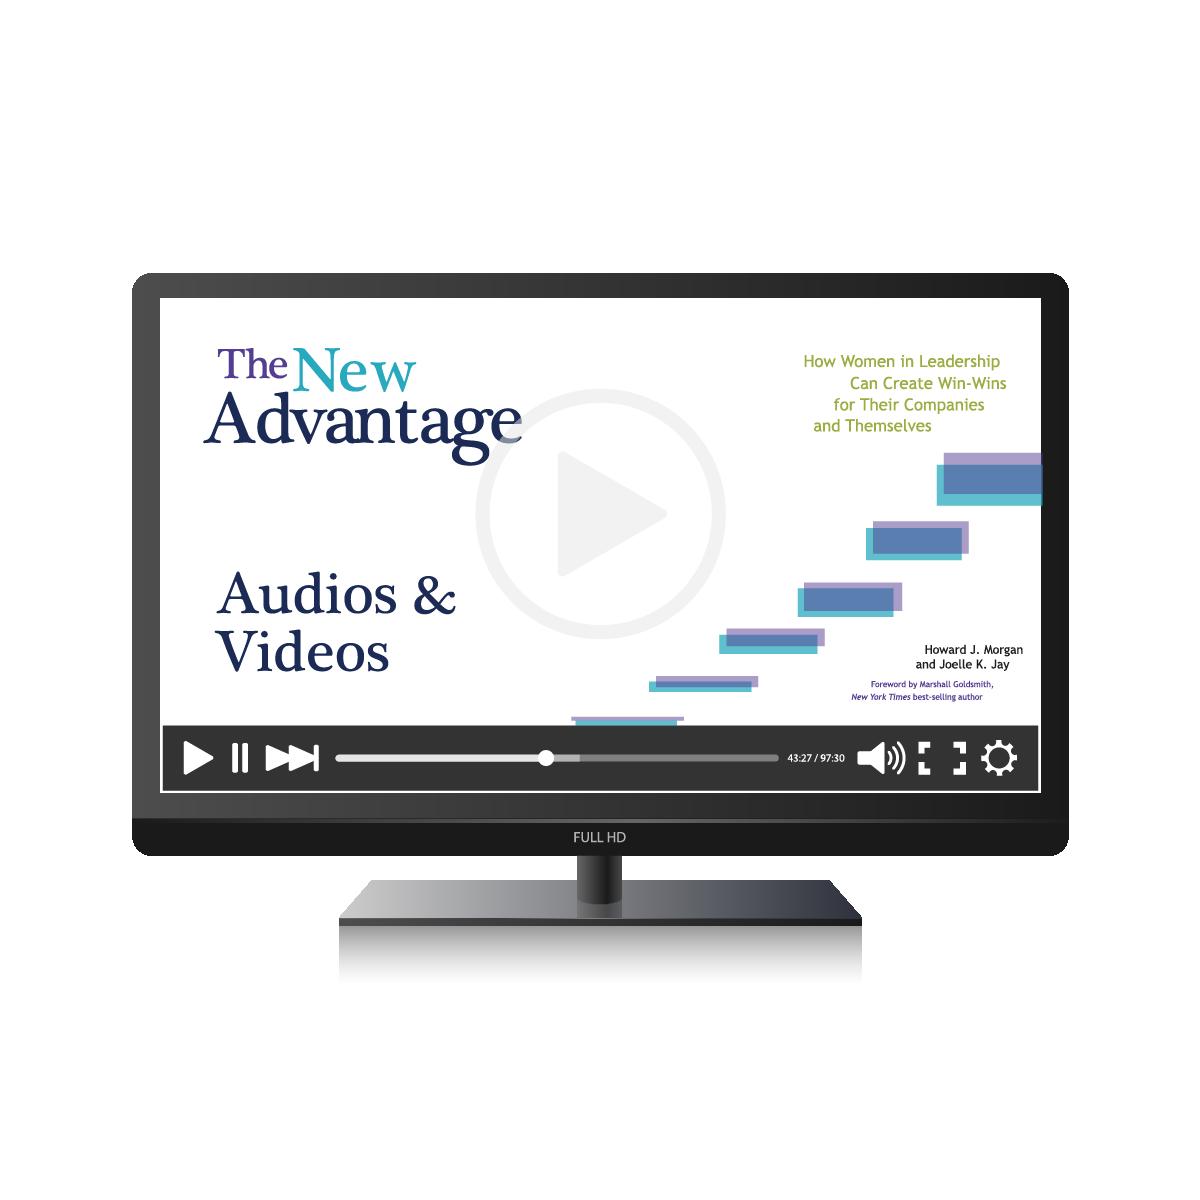 Audios & Videos